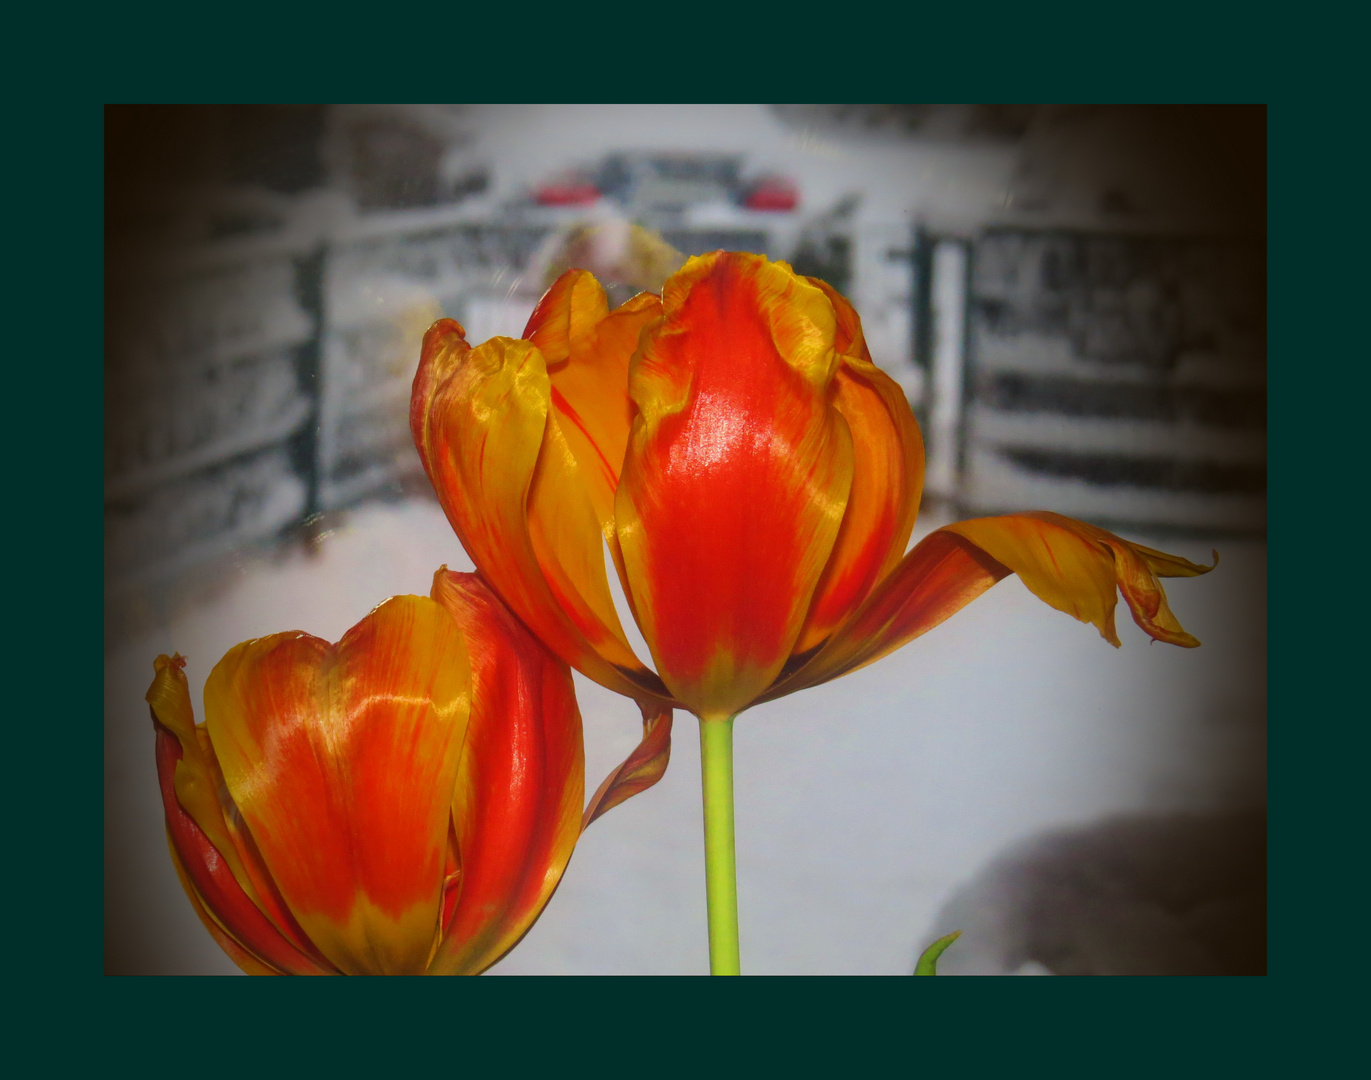 Tulpen-Schnee-Schmelze am Morgen